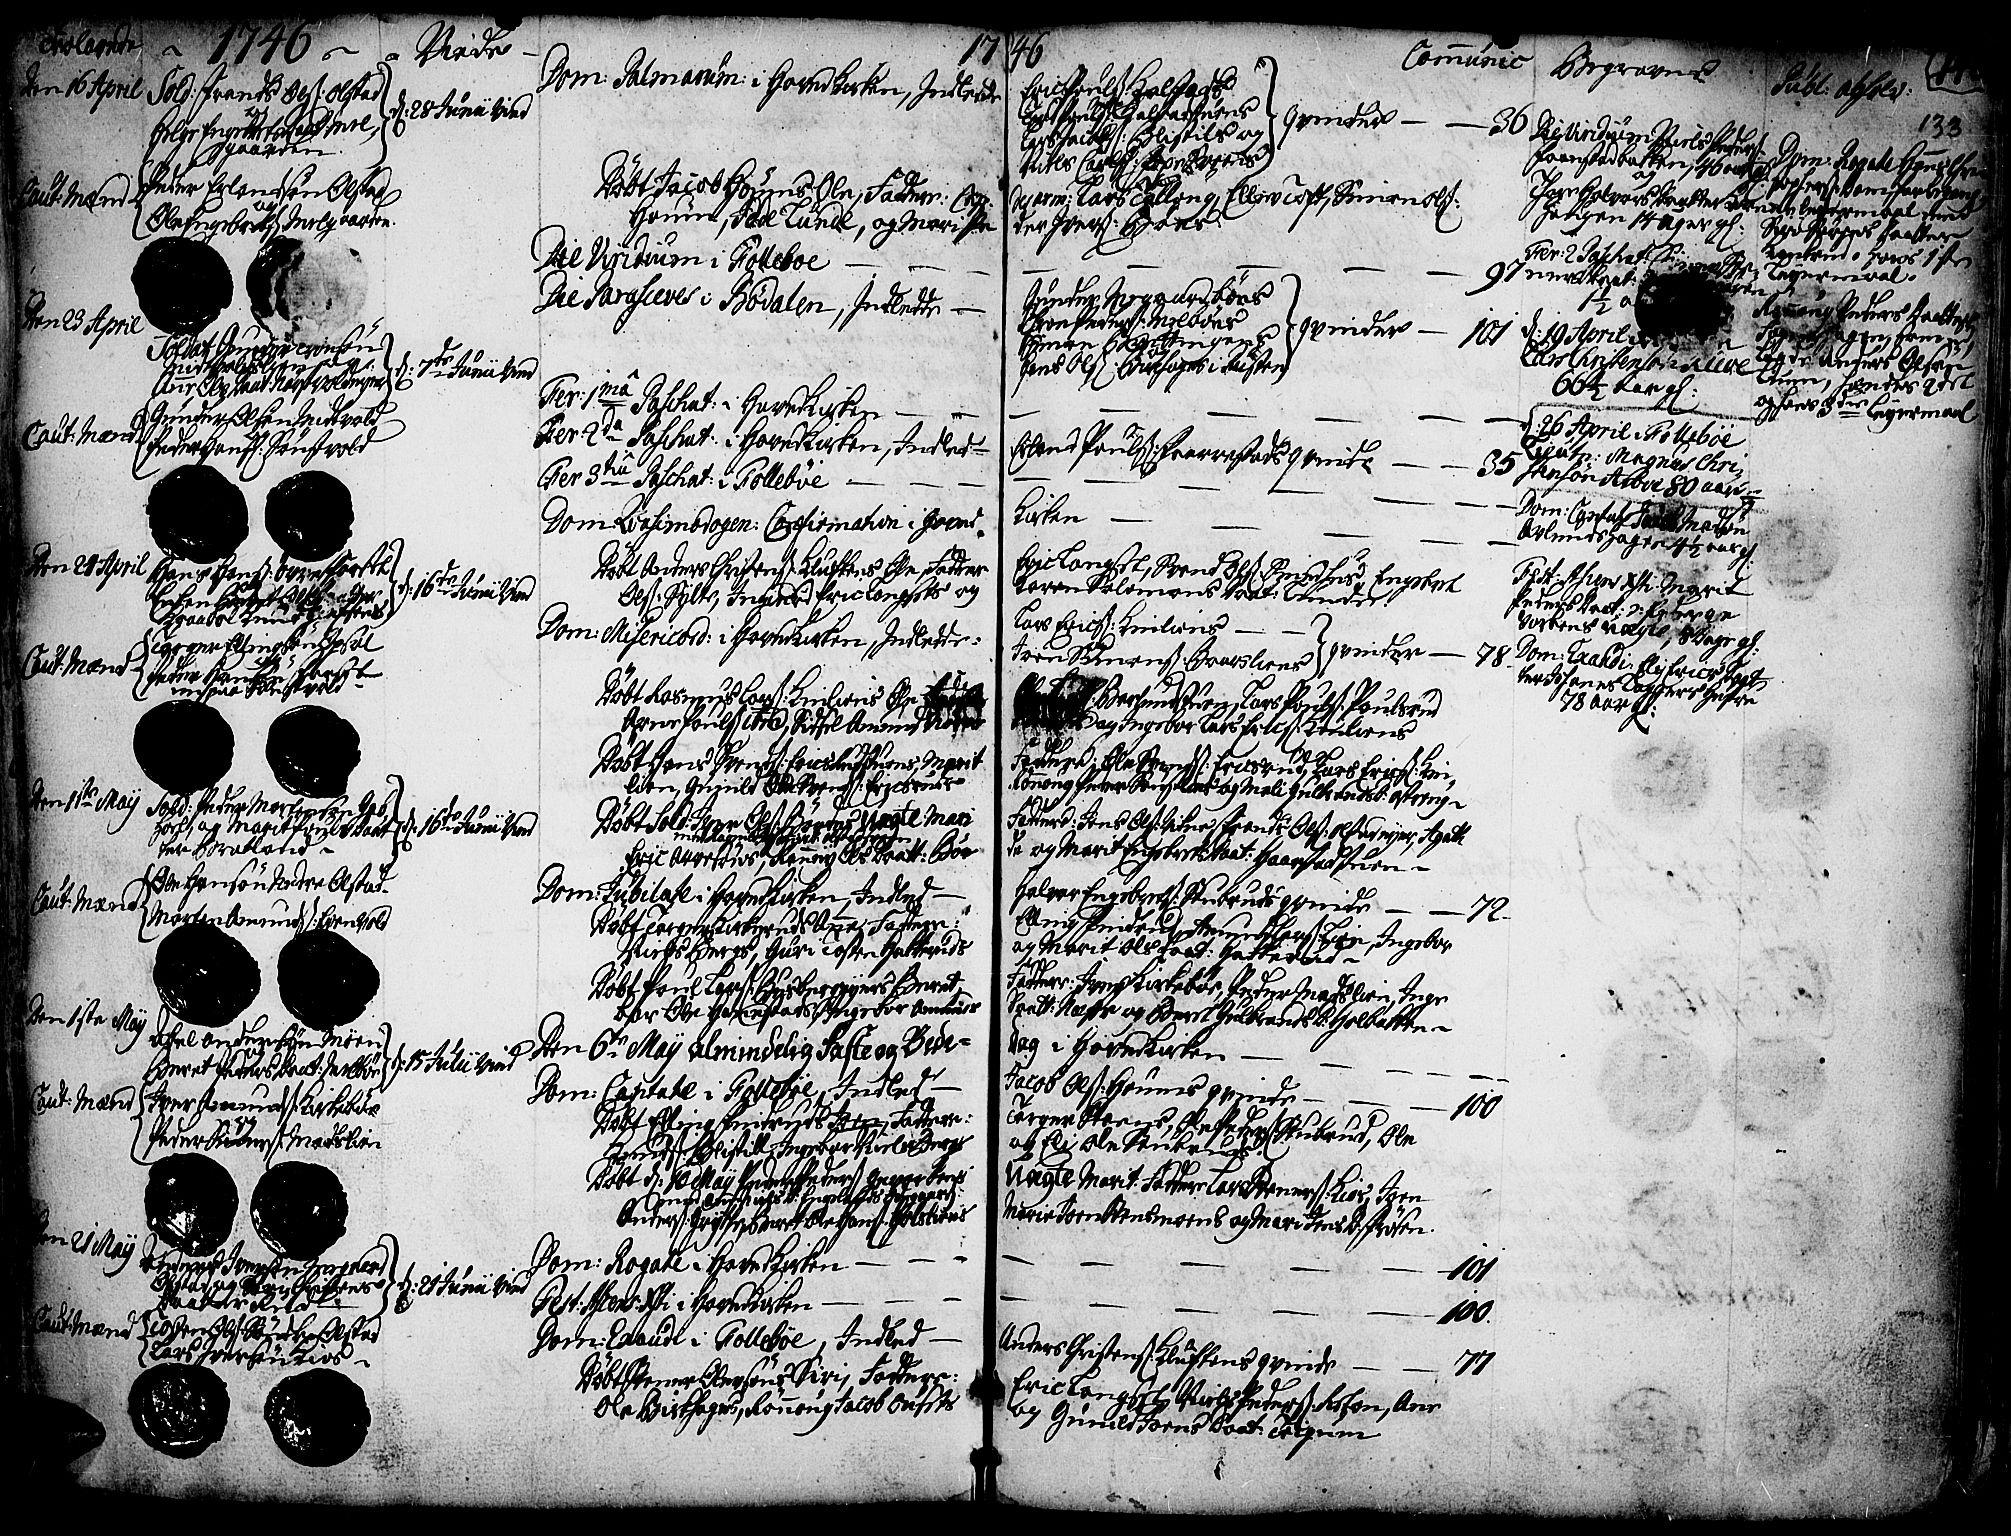 SAH, Gausdal prestekontor, Ministerialbok nr. 2, 1729-1757, s. 133